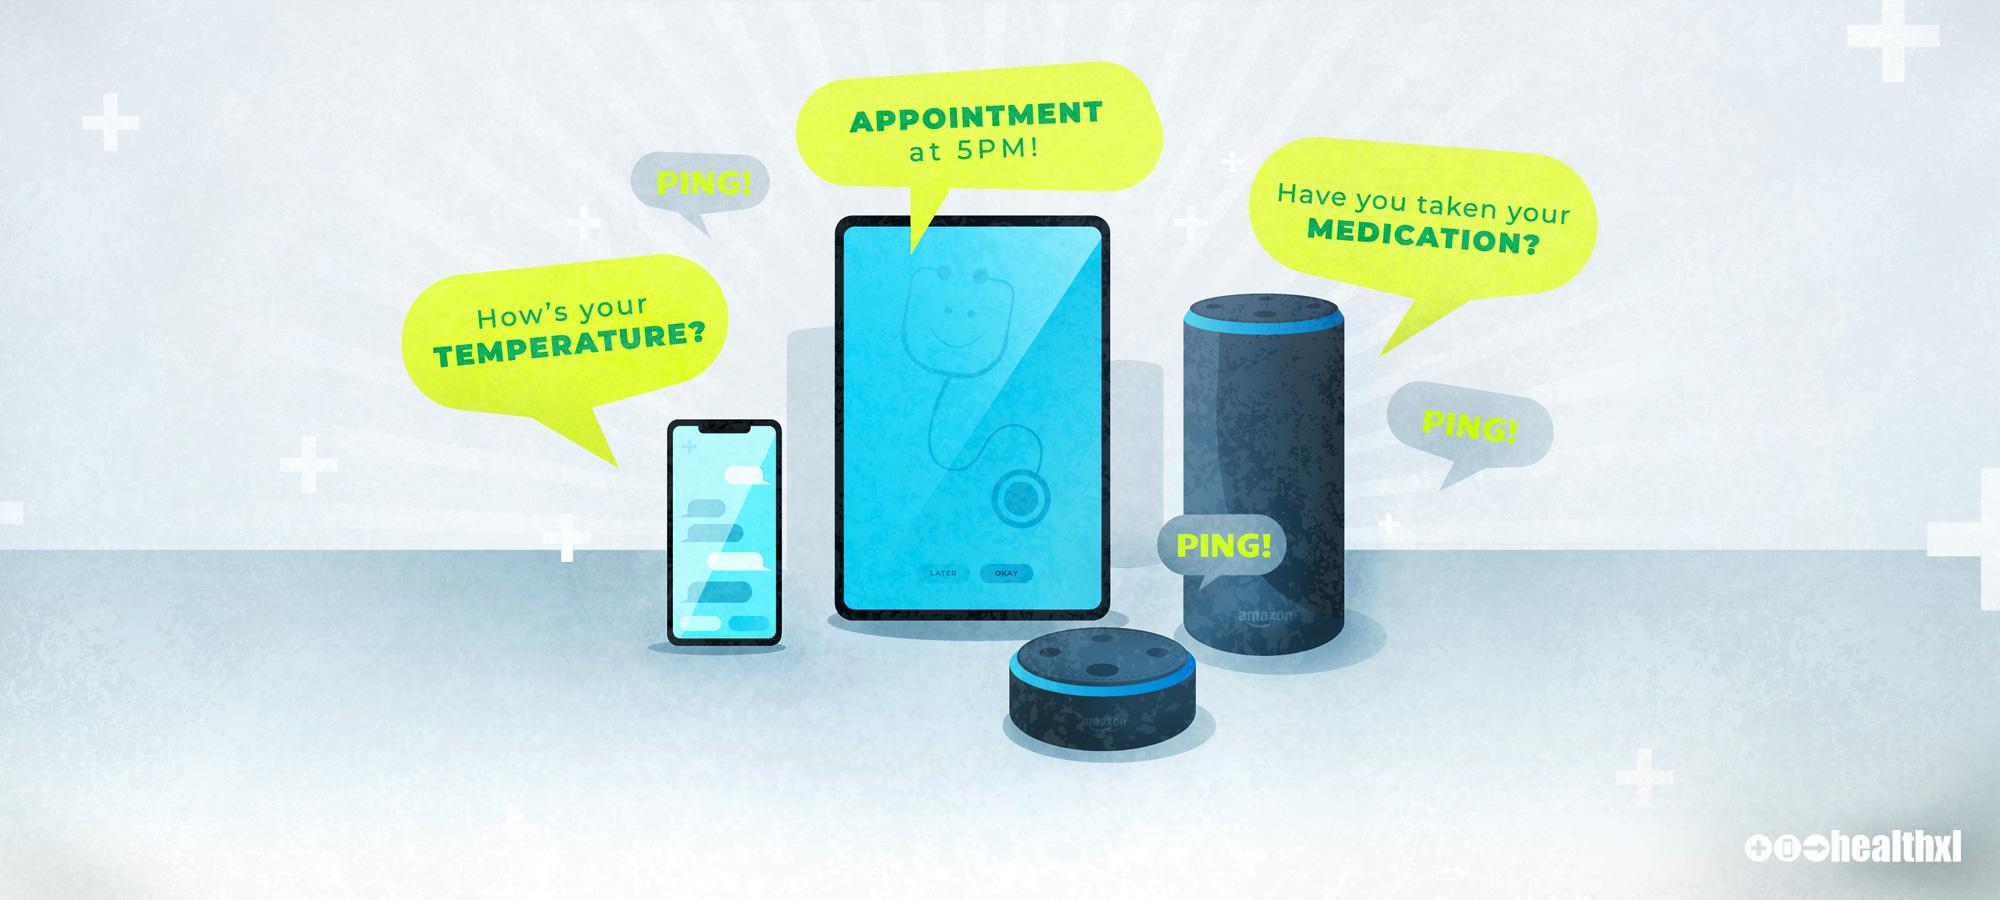 Healthcare 2020 - Virtually a Bot Hub?